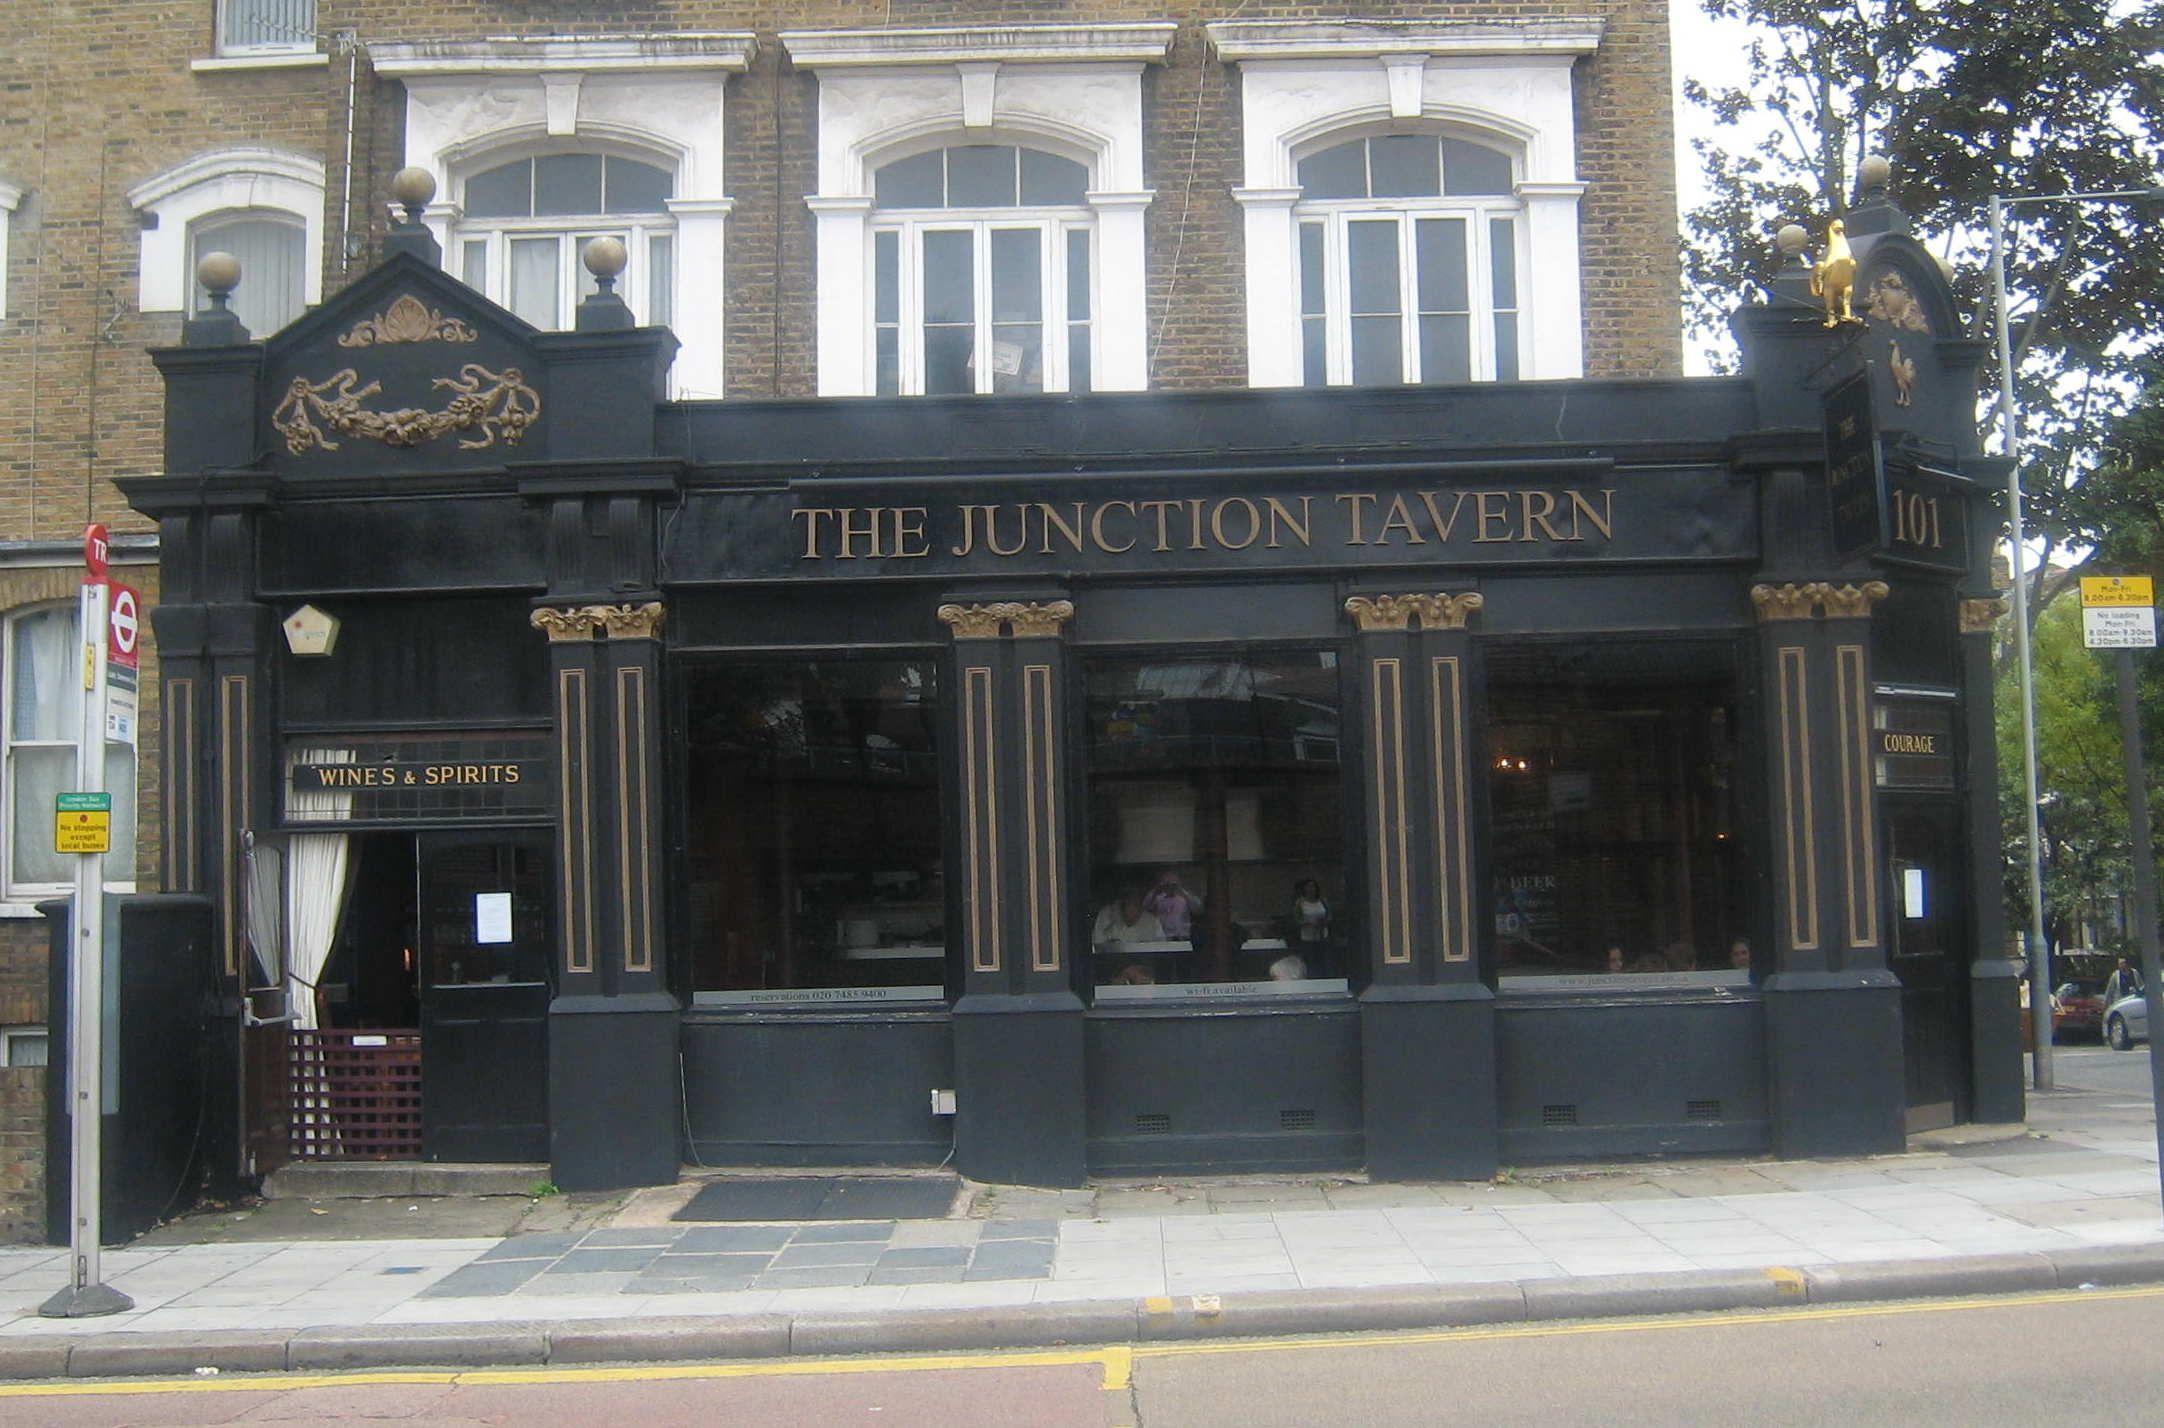 pub exterior background - Google Search   Tavern, Pub ...